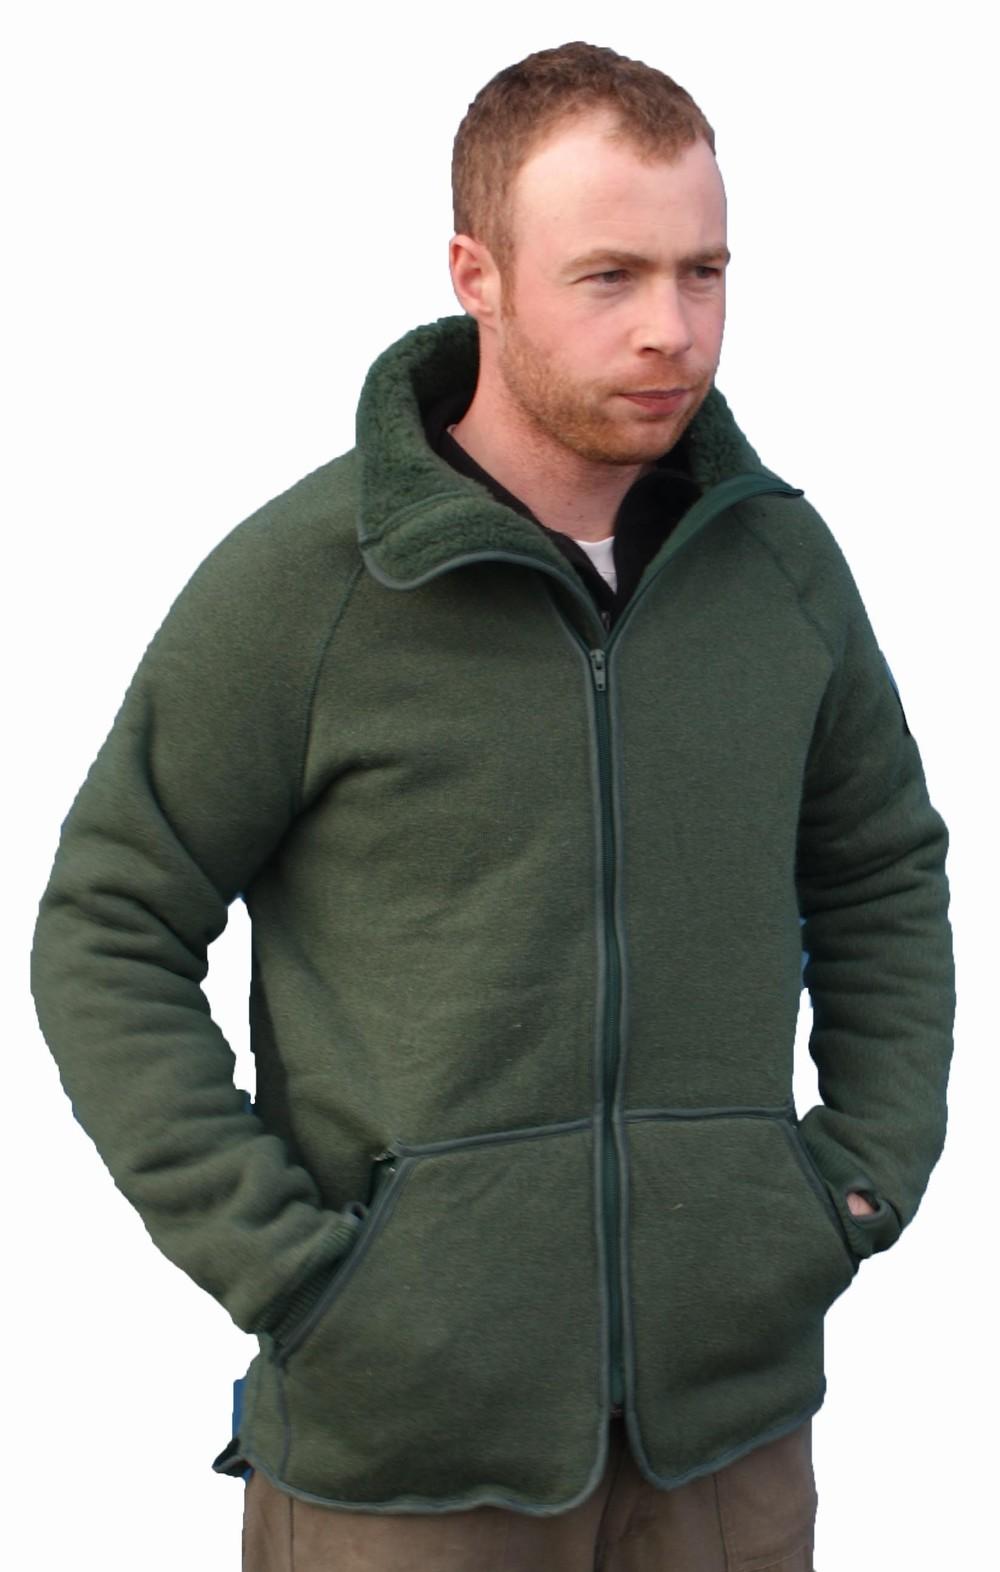 dutch army 39 helly hansen 39 fleece jacket. Black Bedroom Furniture Sets. Home Design Ideas